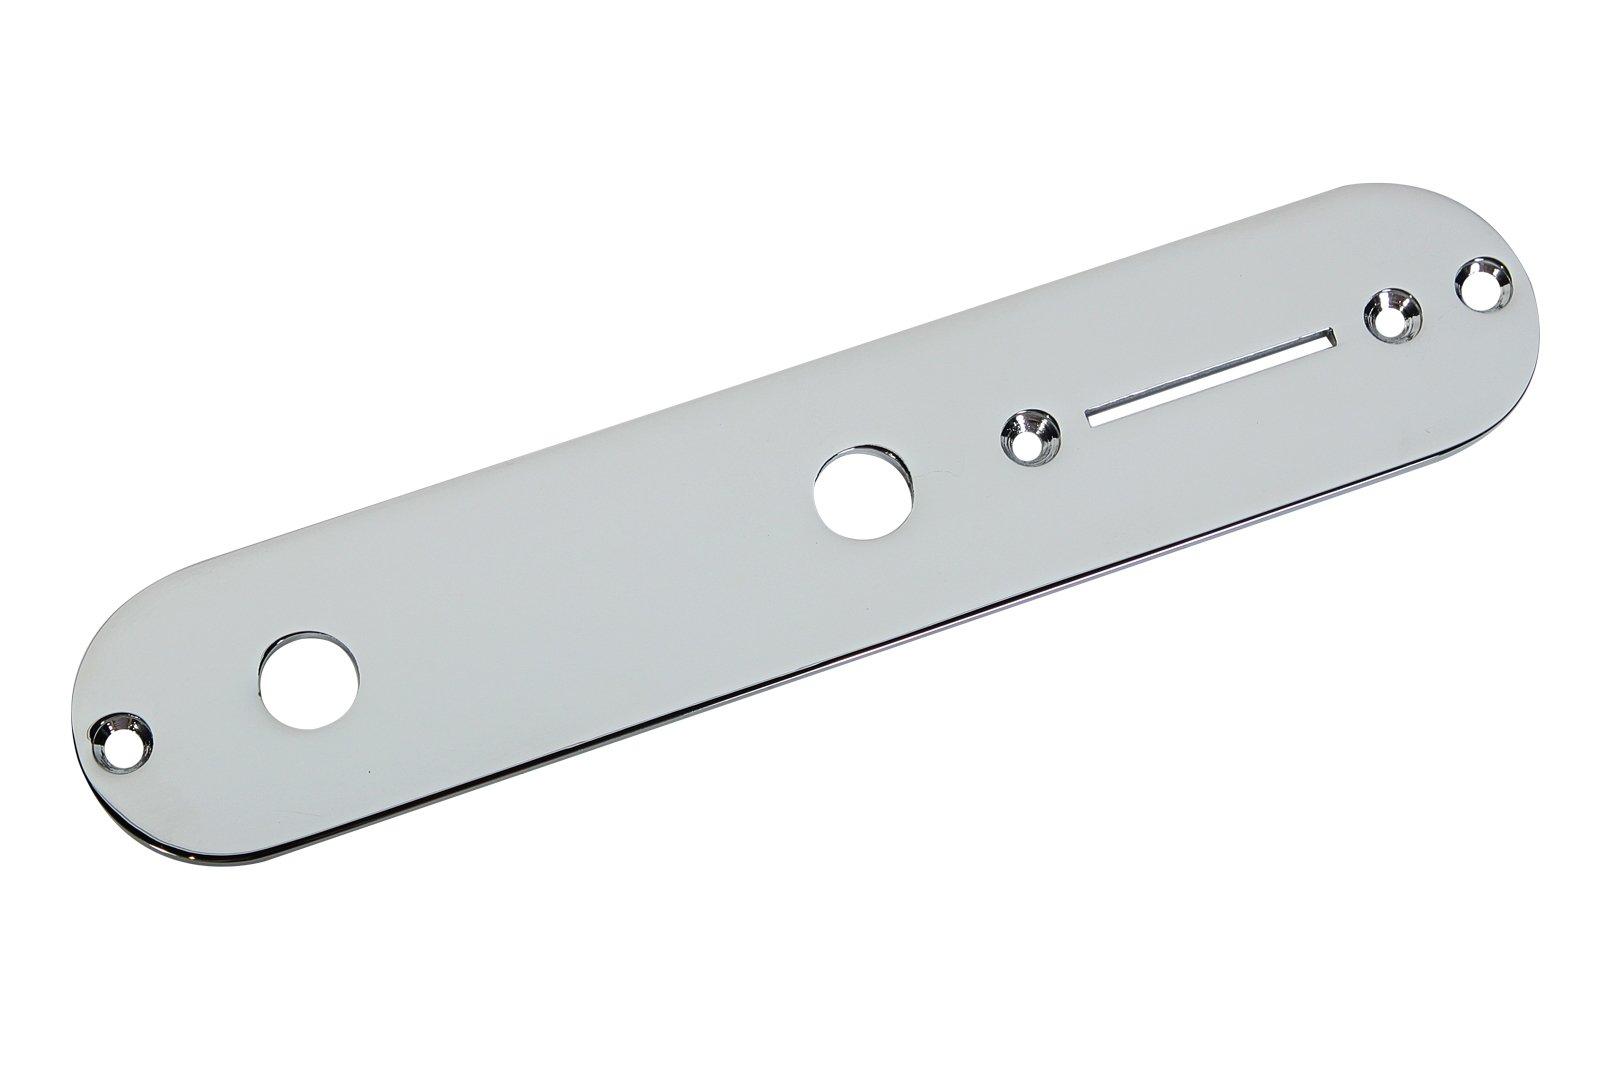 Fender Tele Telecaster Control Plate, Chrome